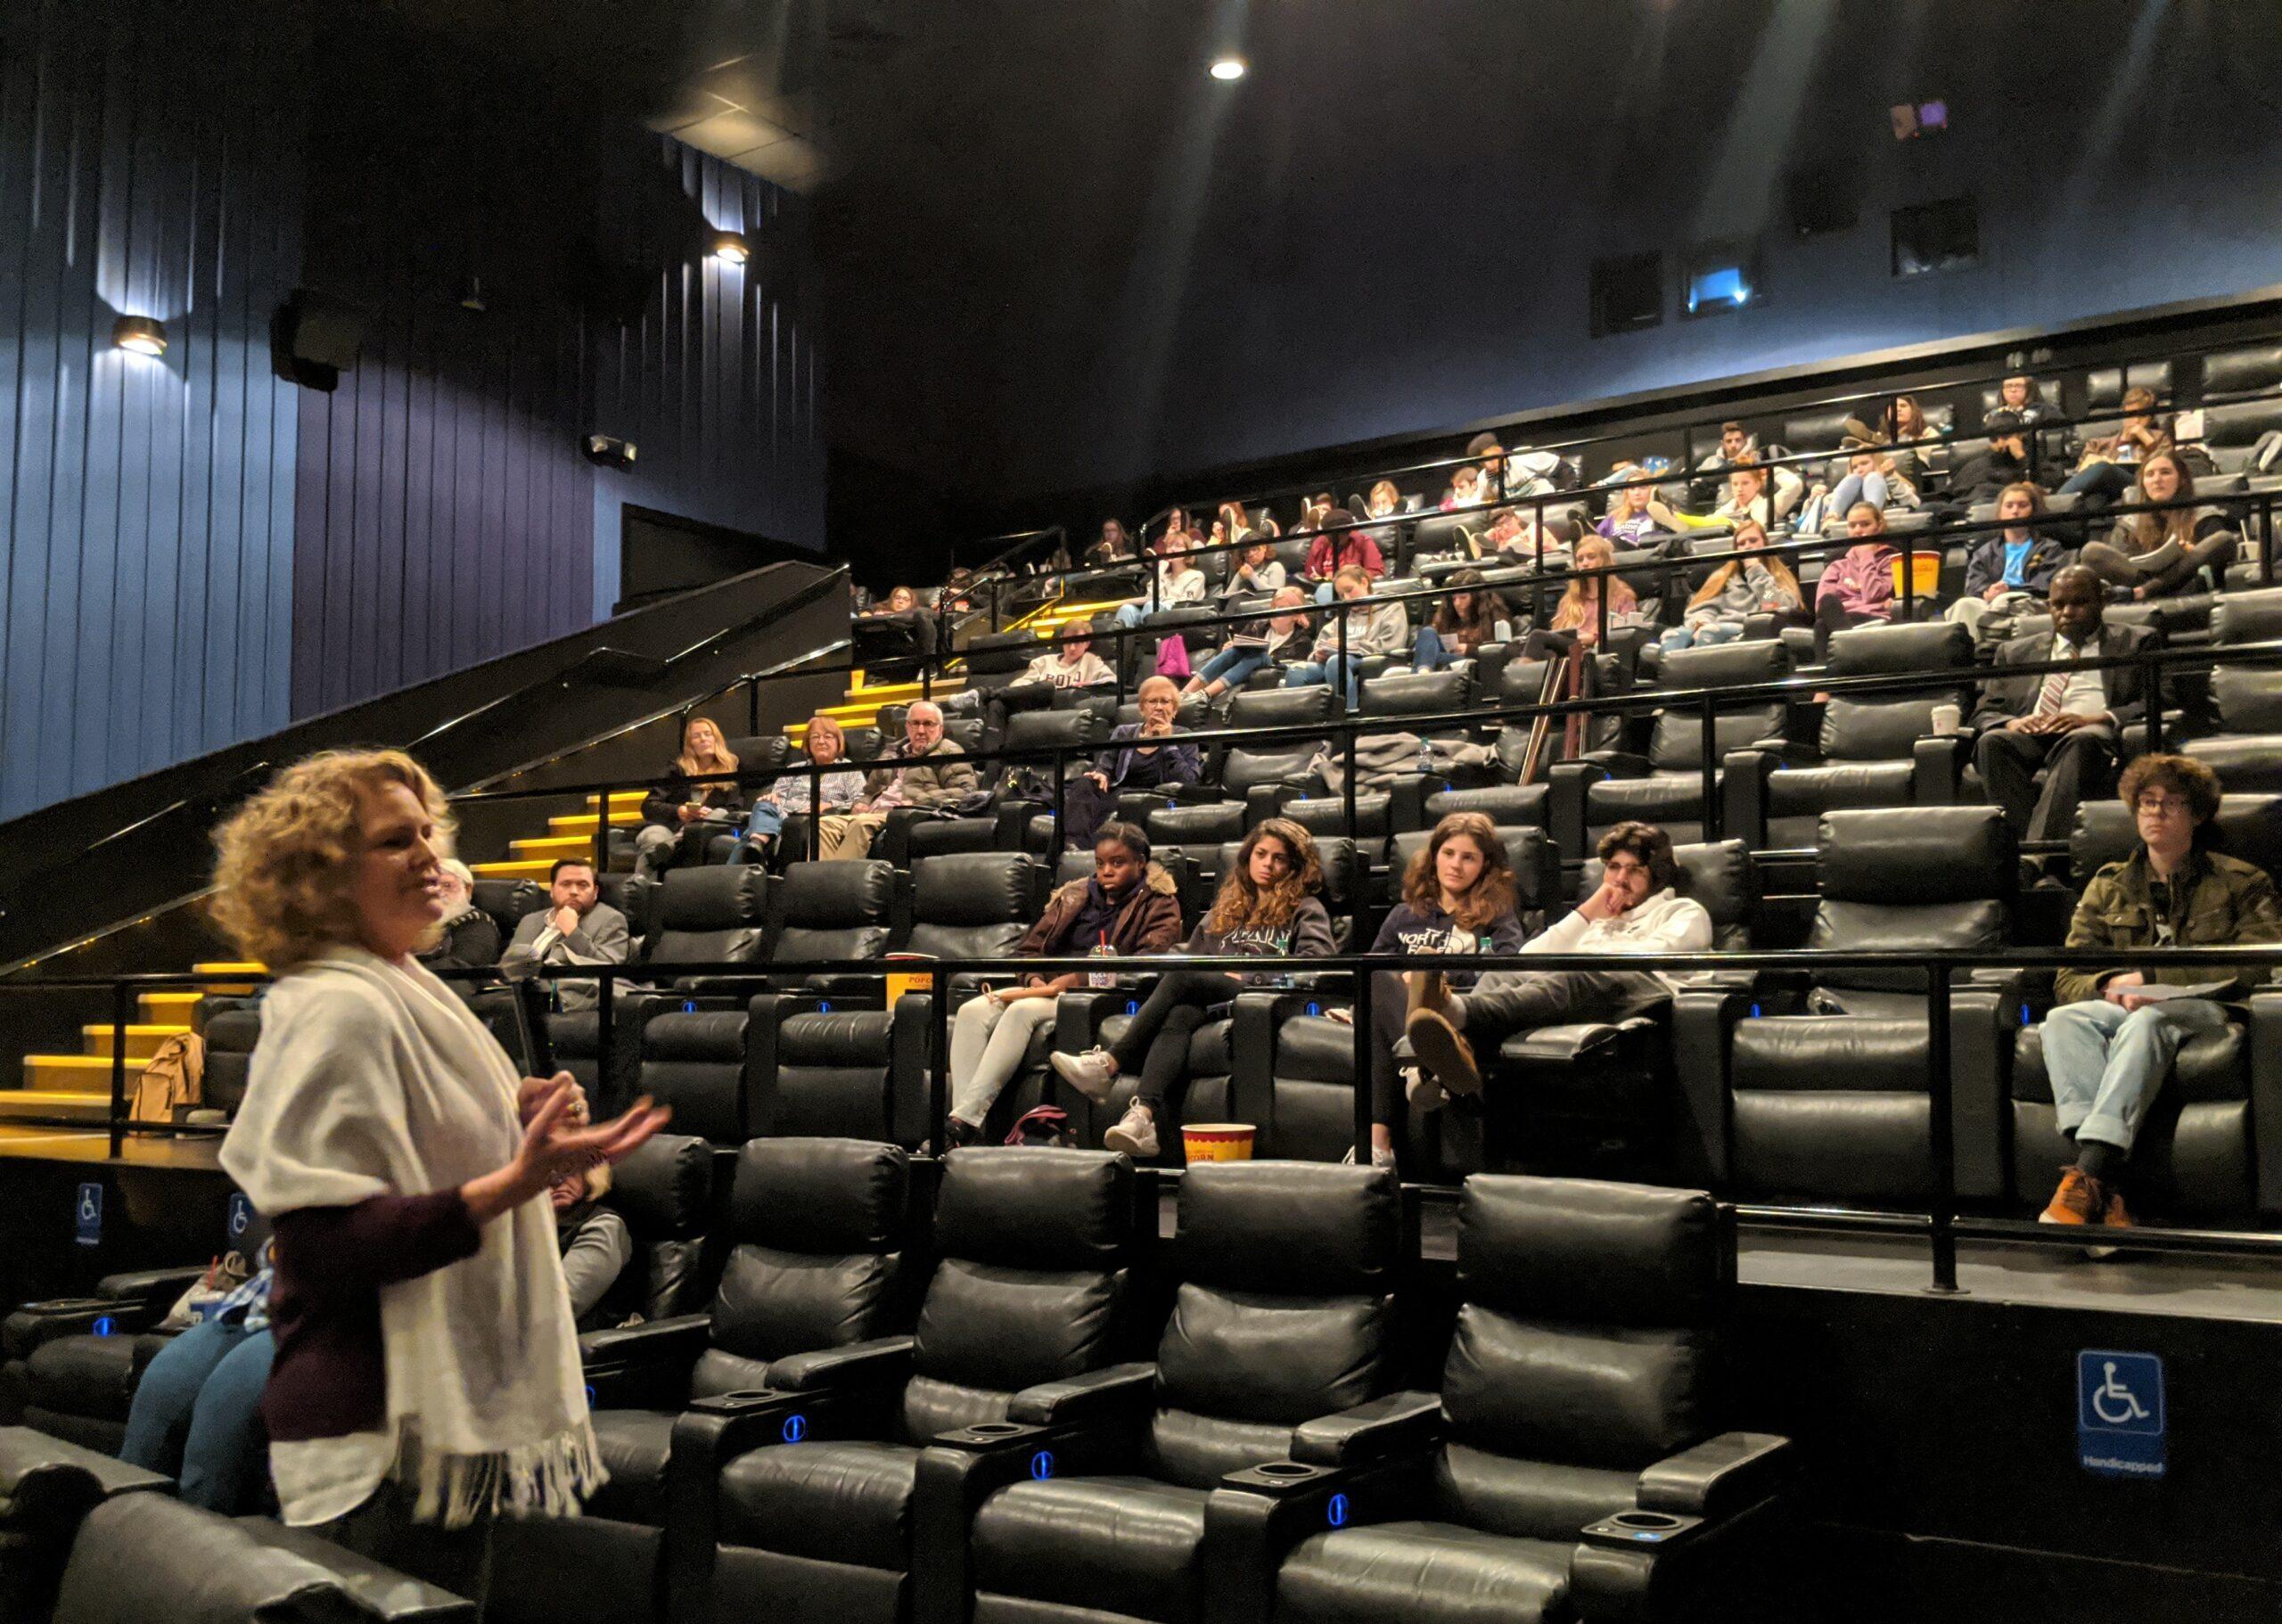 Author/historian Kate Clifford Larson talks to students inside Penn Cinema